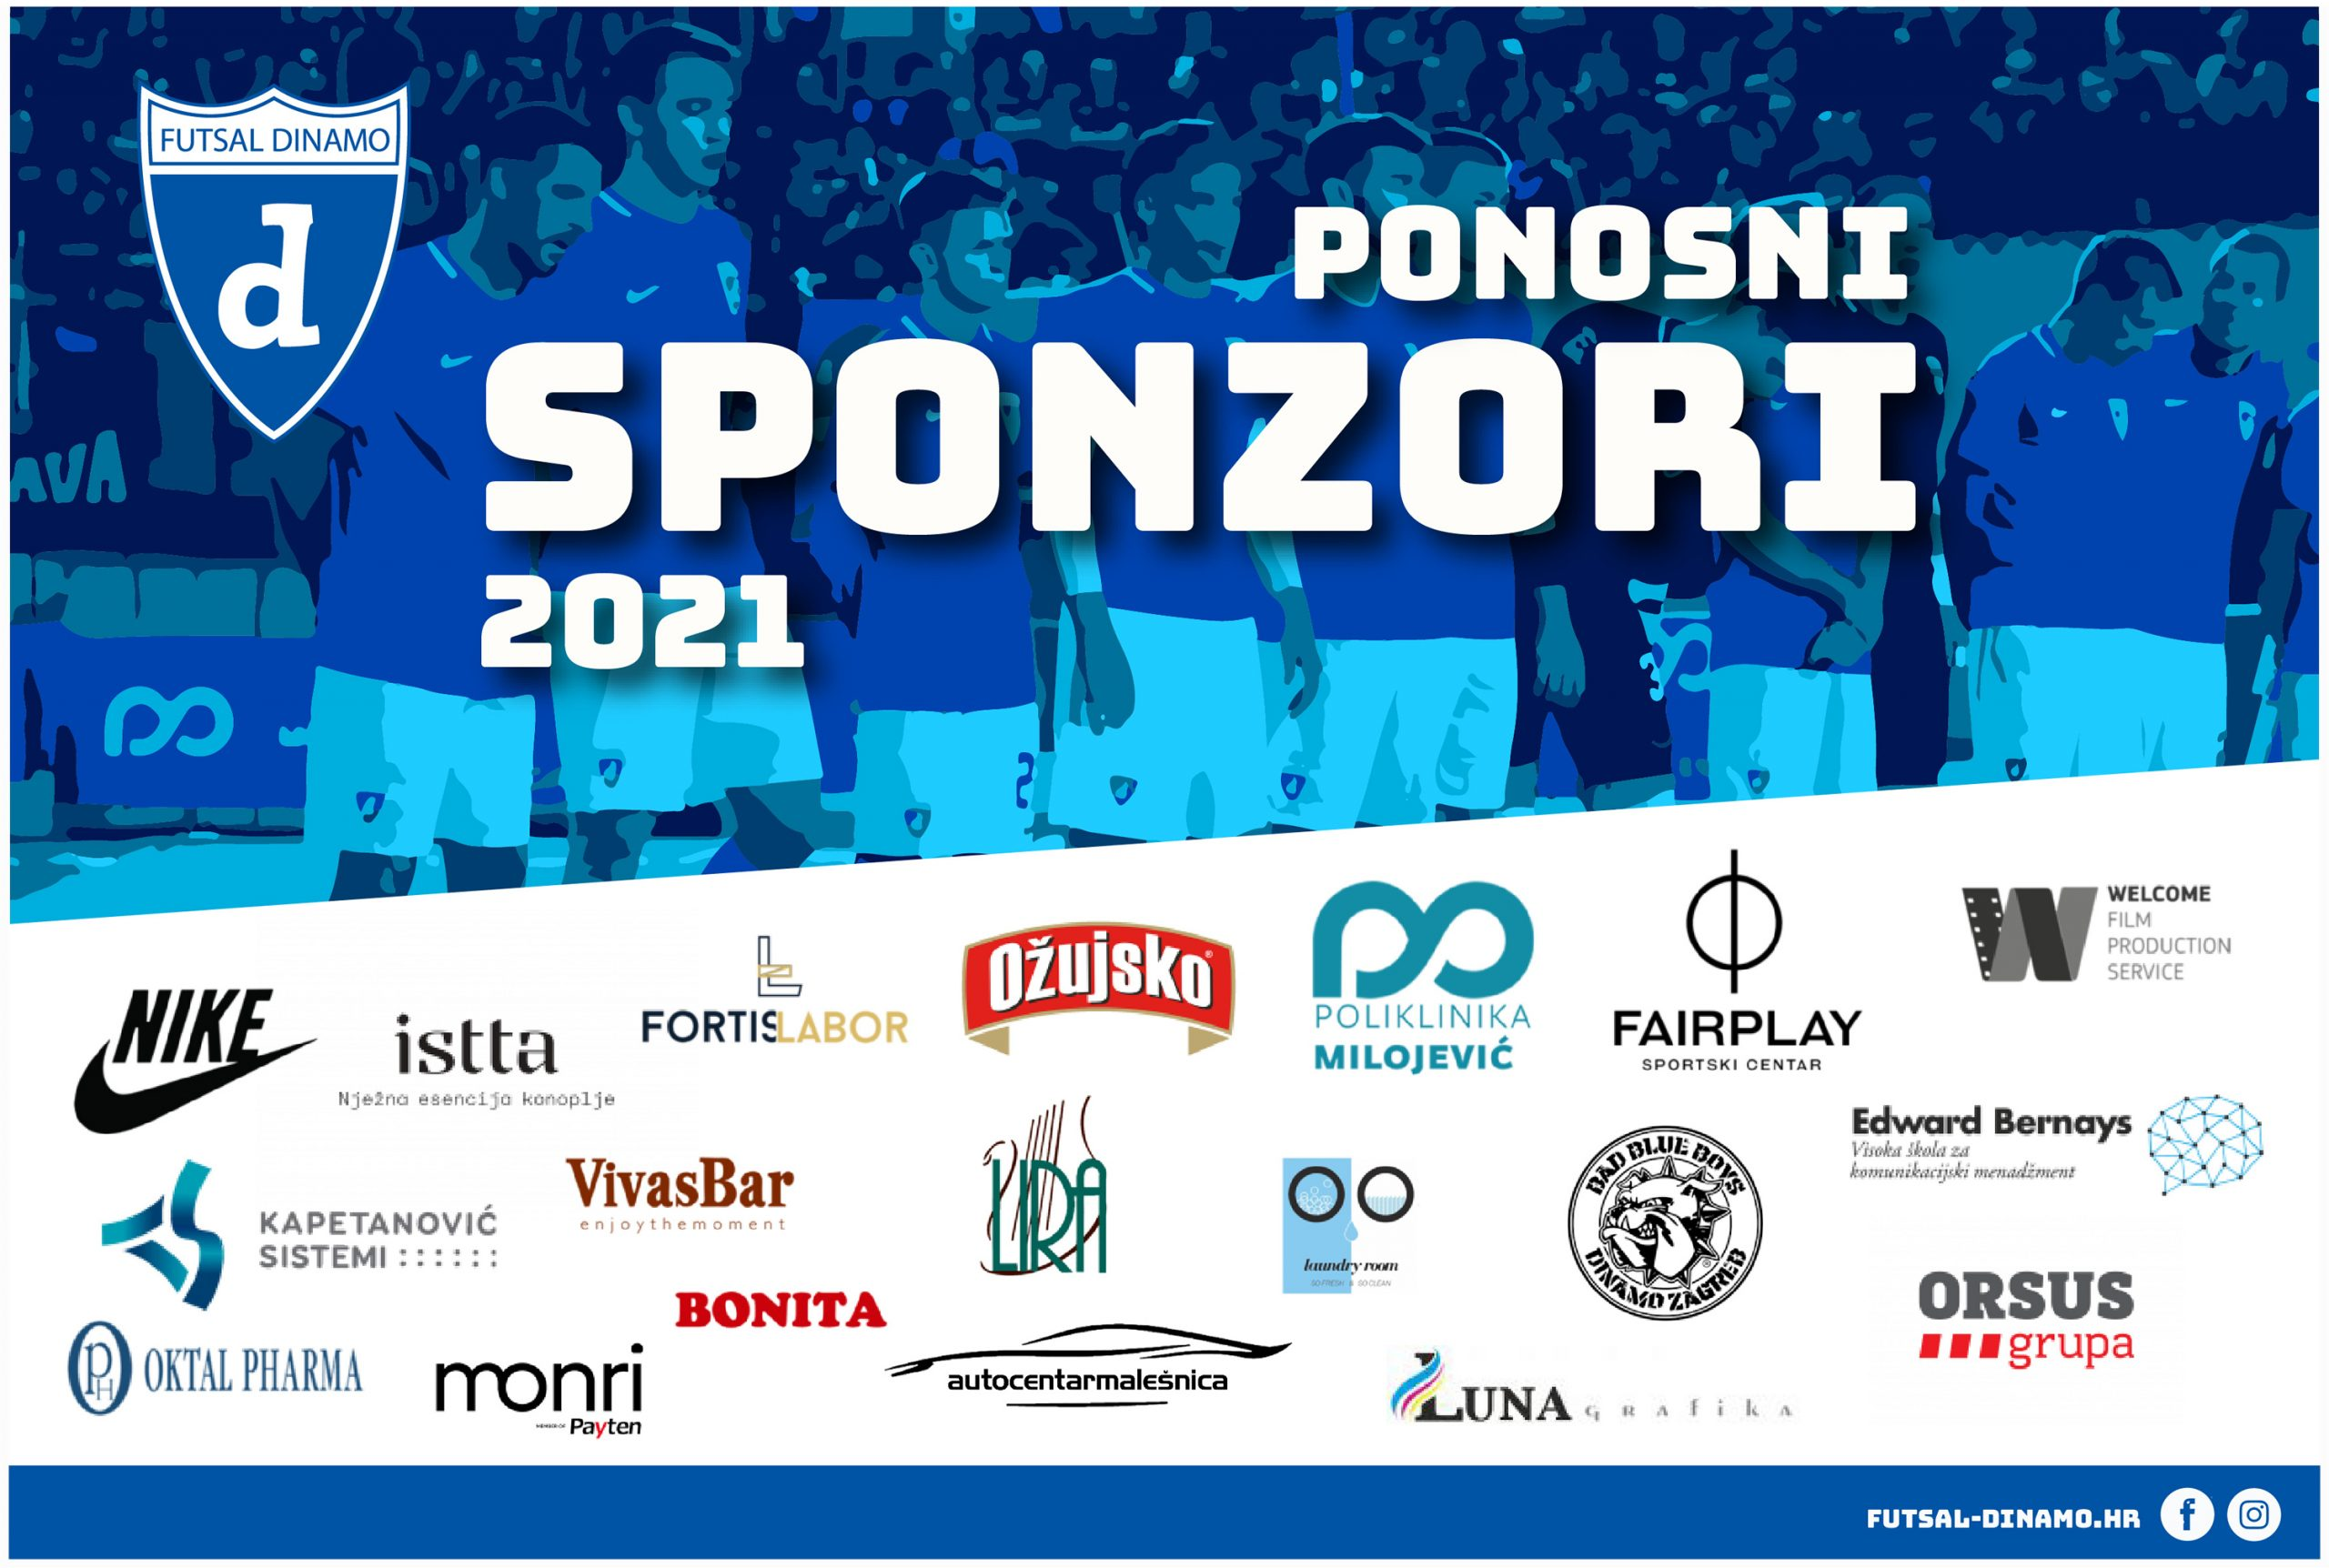 Dinamovi sponzori